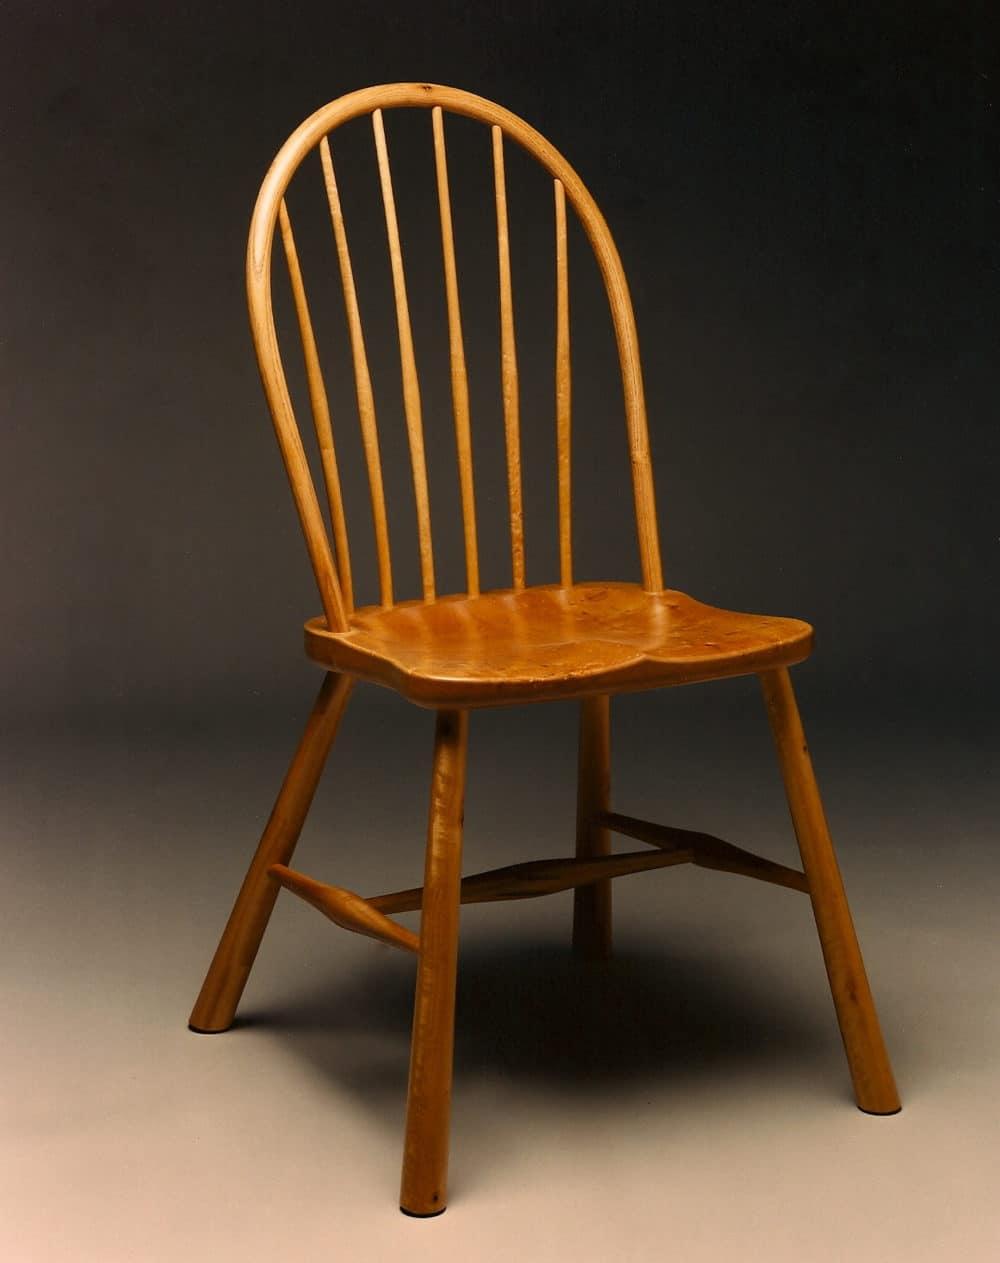 Gregory Hay Designs Windsor Sidechair in Bay/Laurel